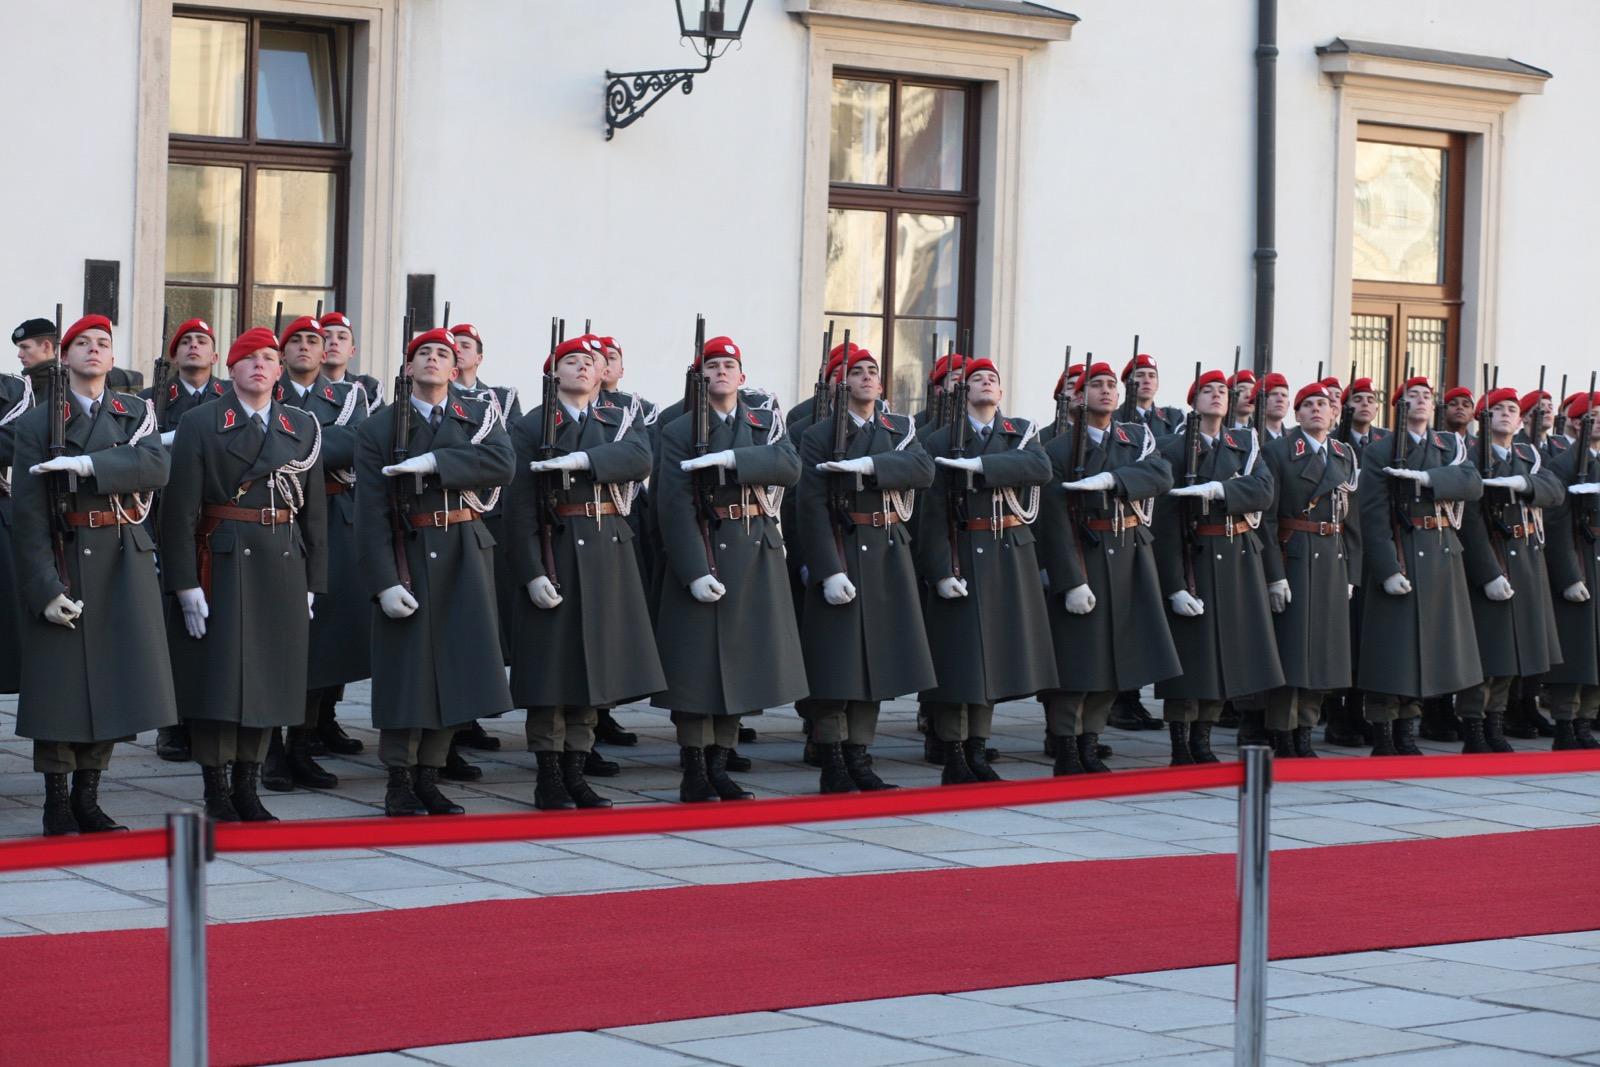 2019_01_11_1Gardekompanie_HBP_SUI_Präsident_Schweiz_Burghof - 22 of 36